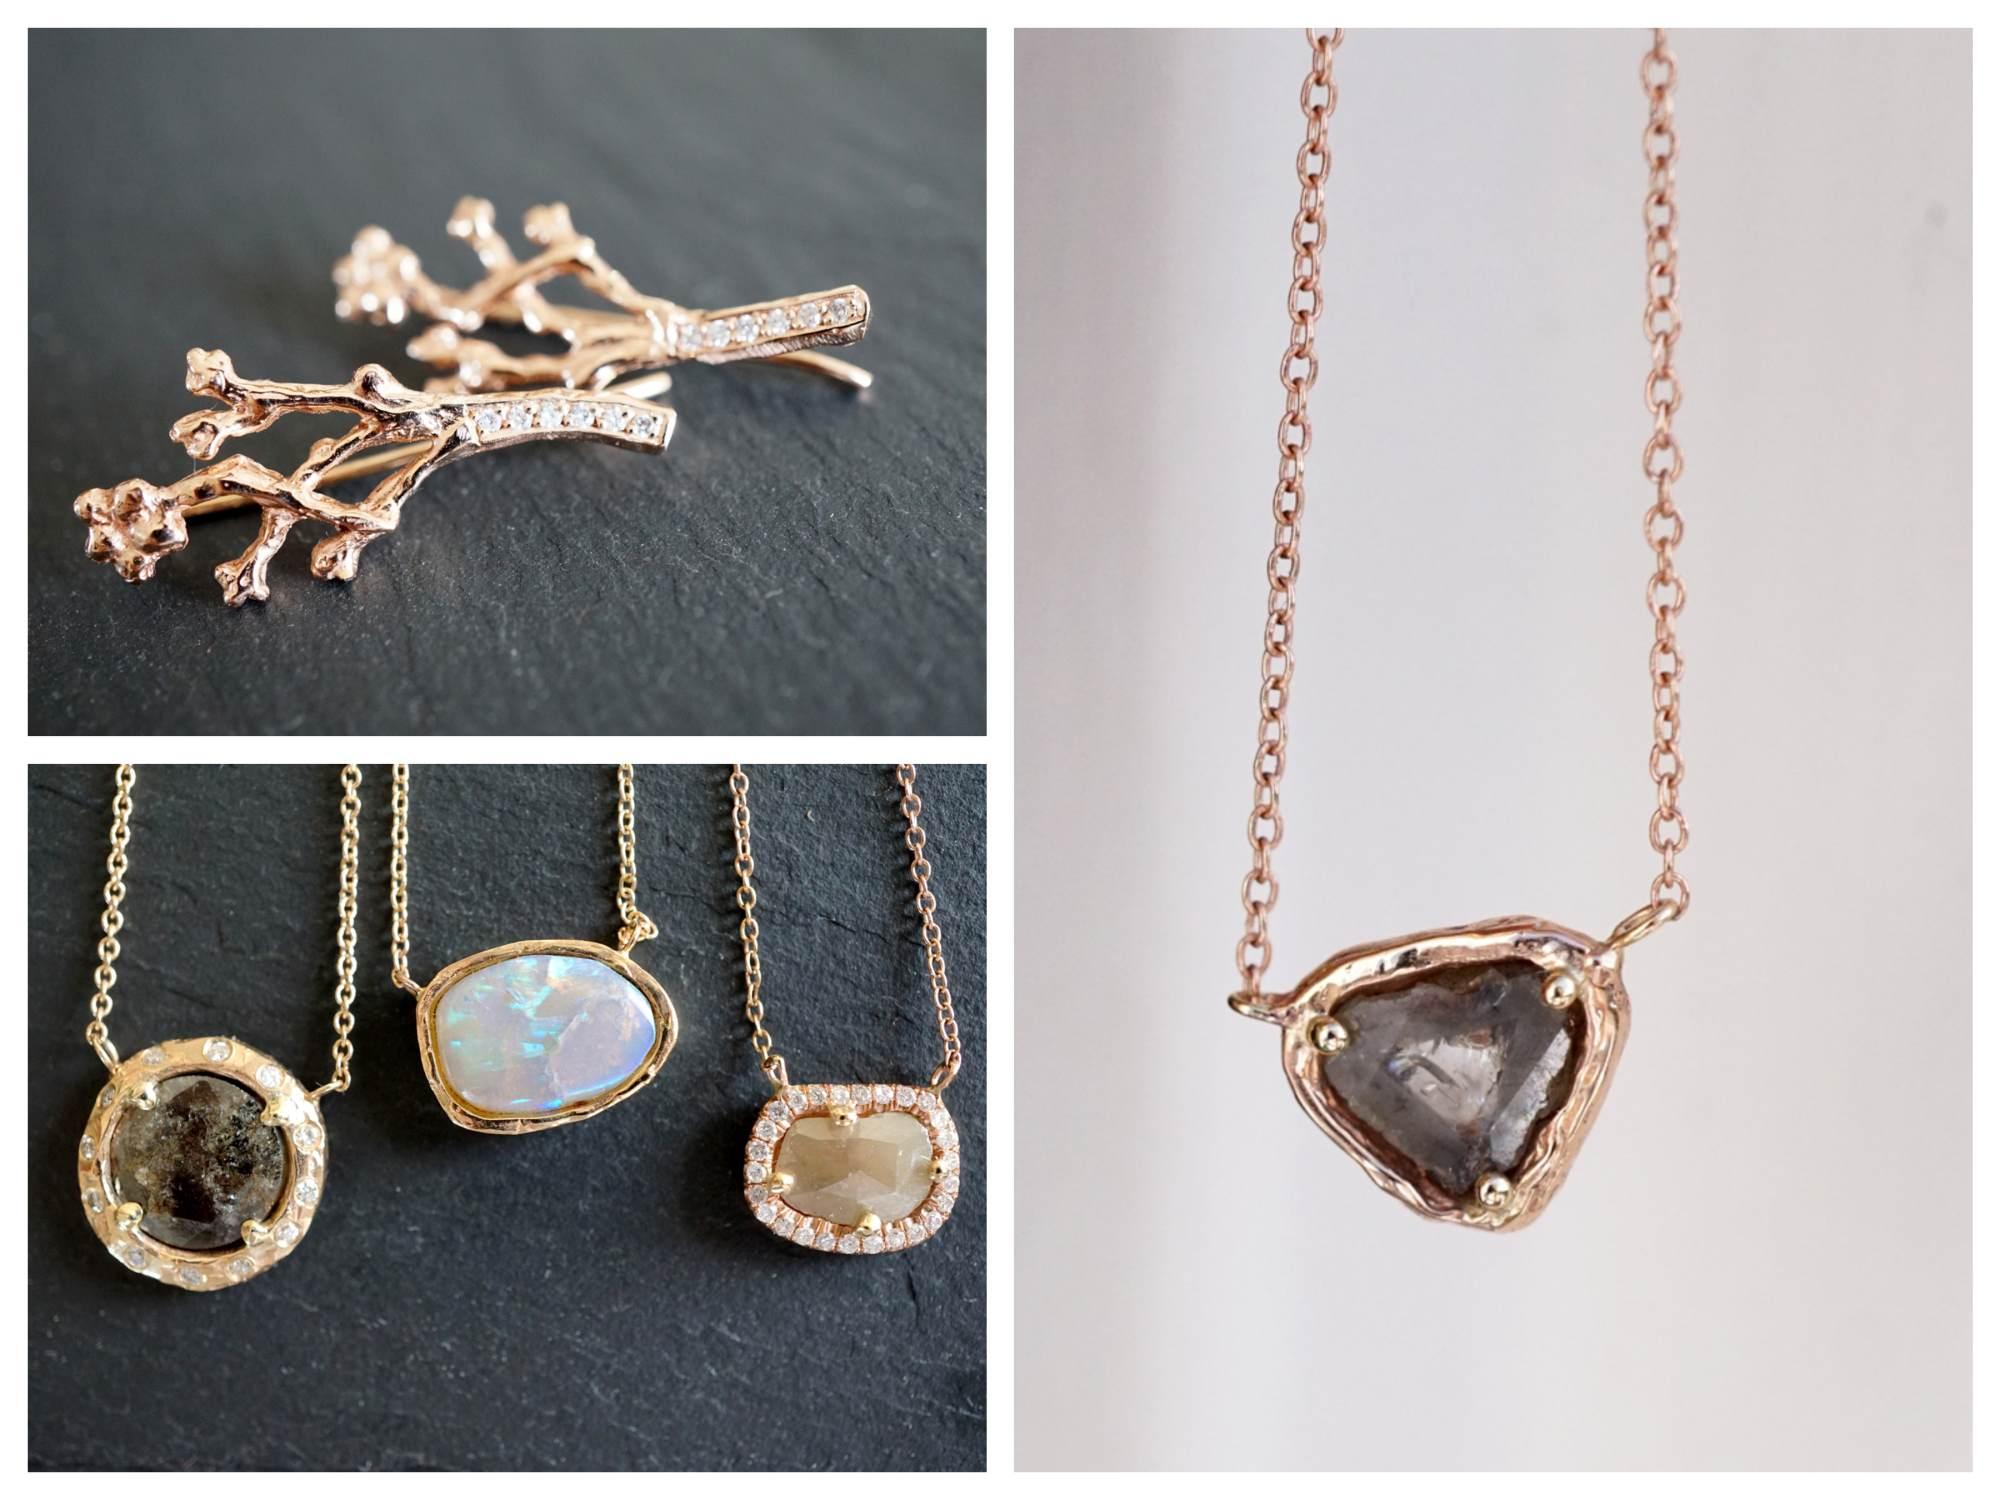 corinne simon jewelry 23